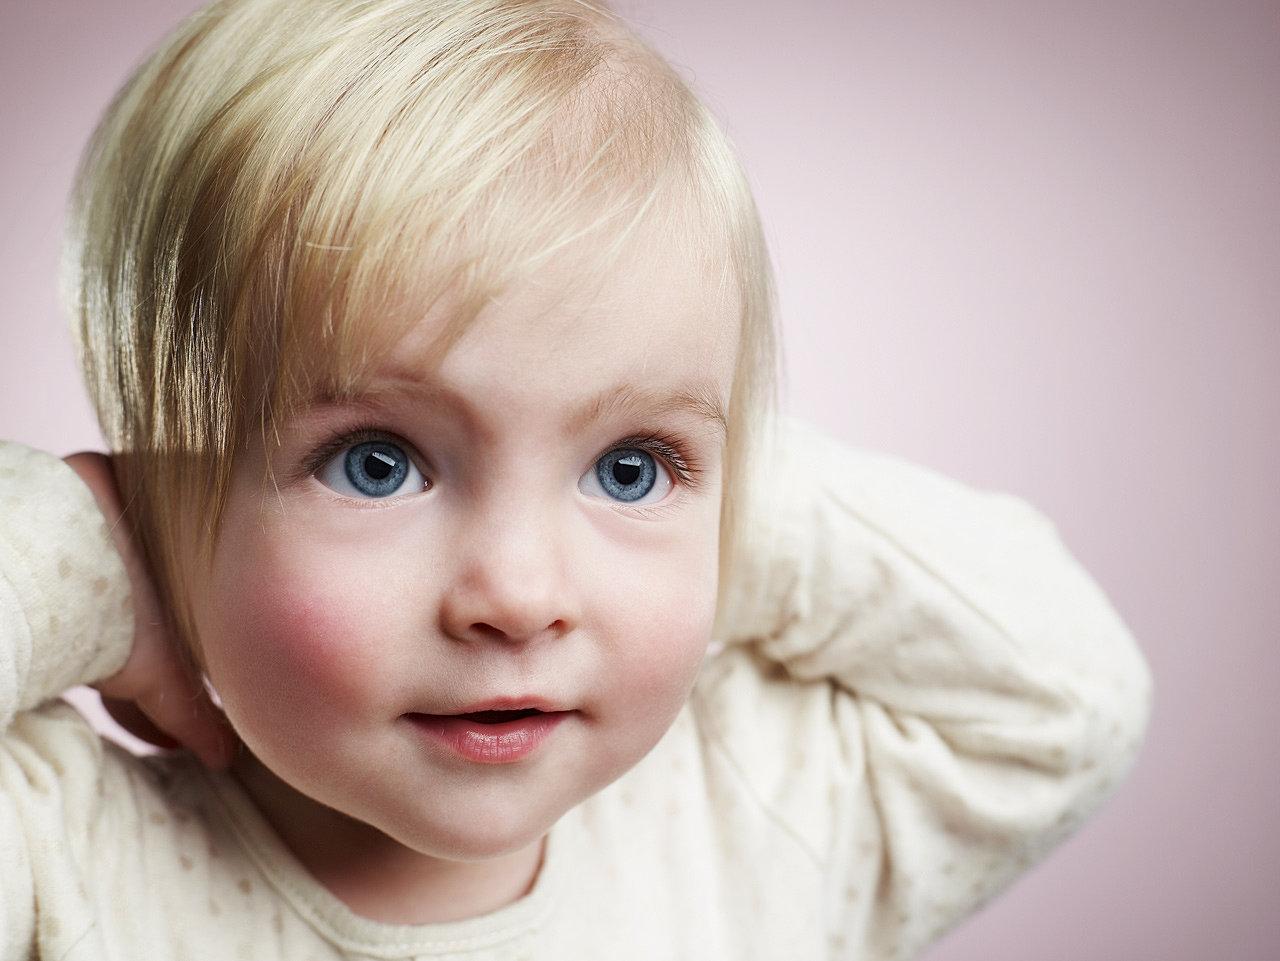 gulf-coast-psych | Blonde Baby Girl